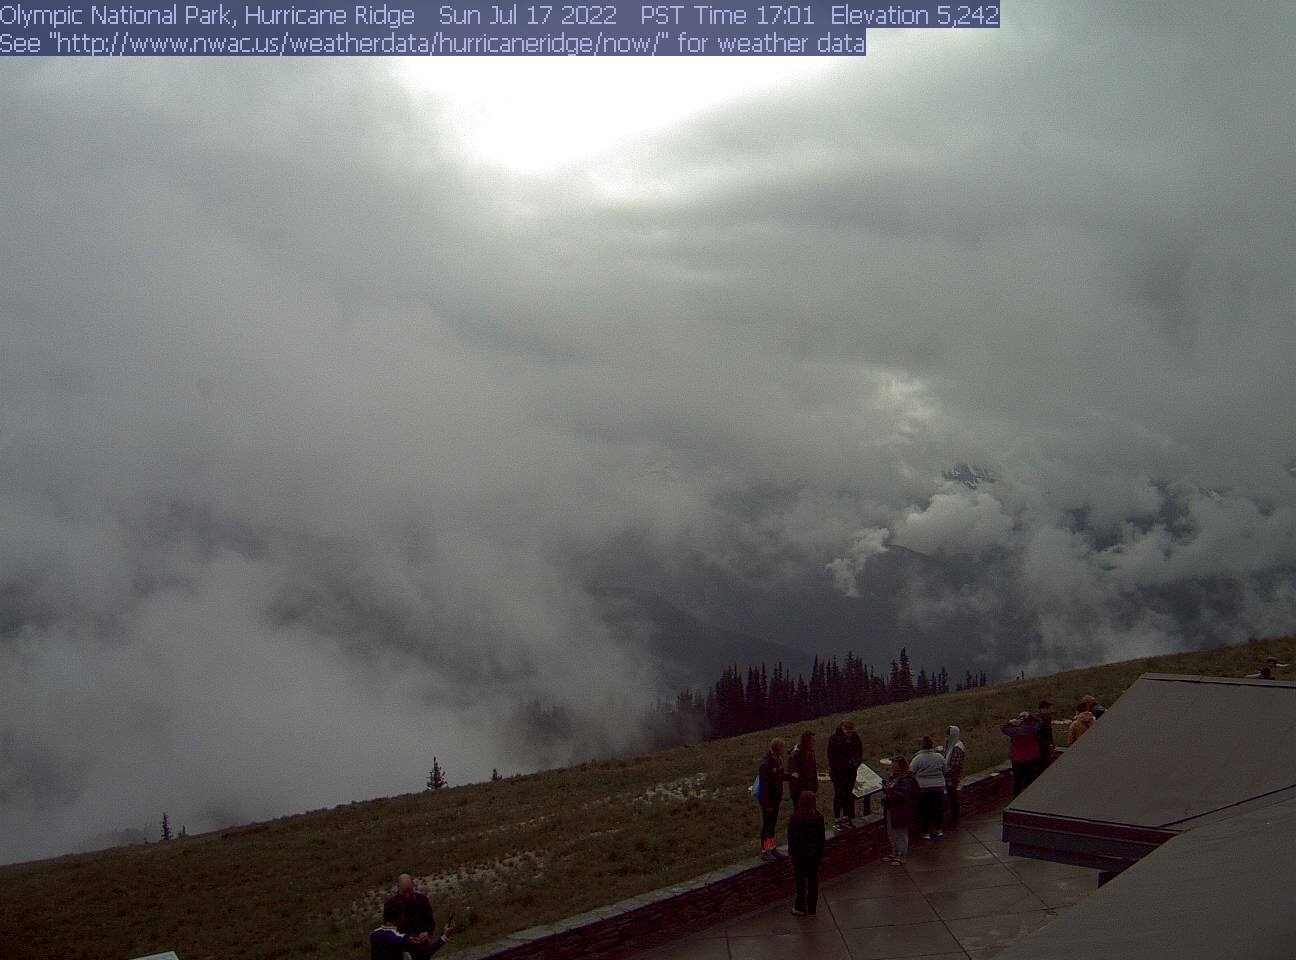 Hurricane Ridge preview image